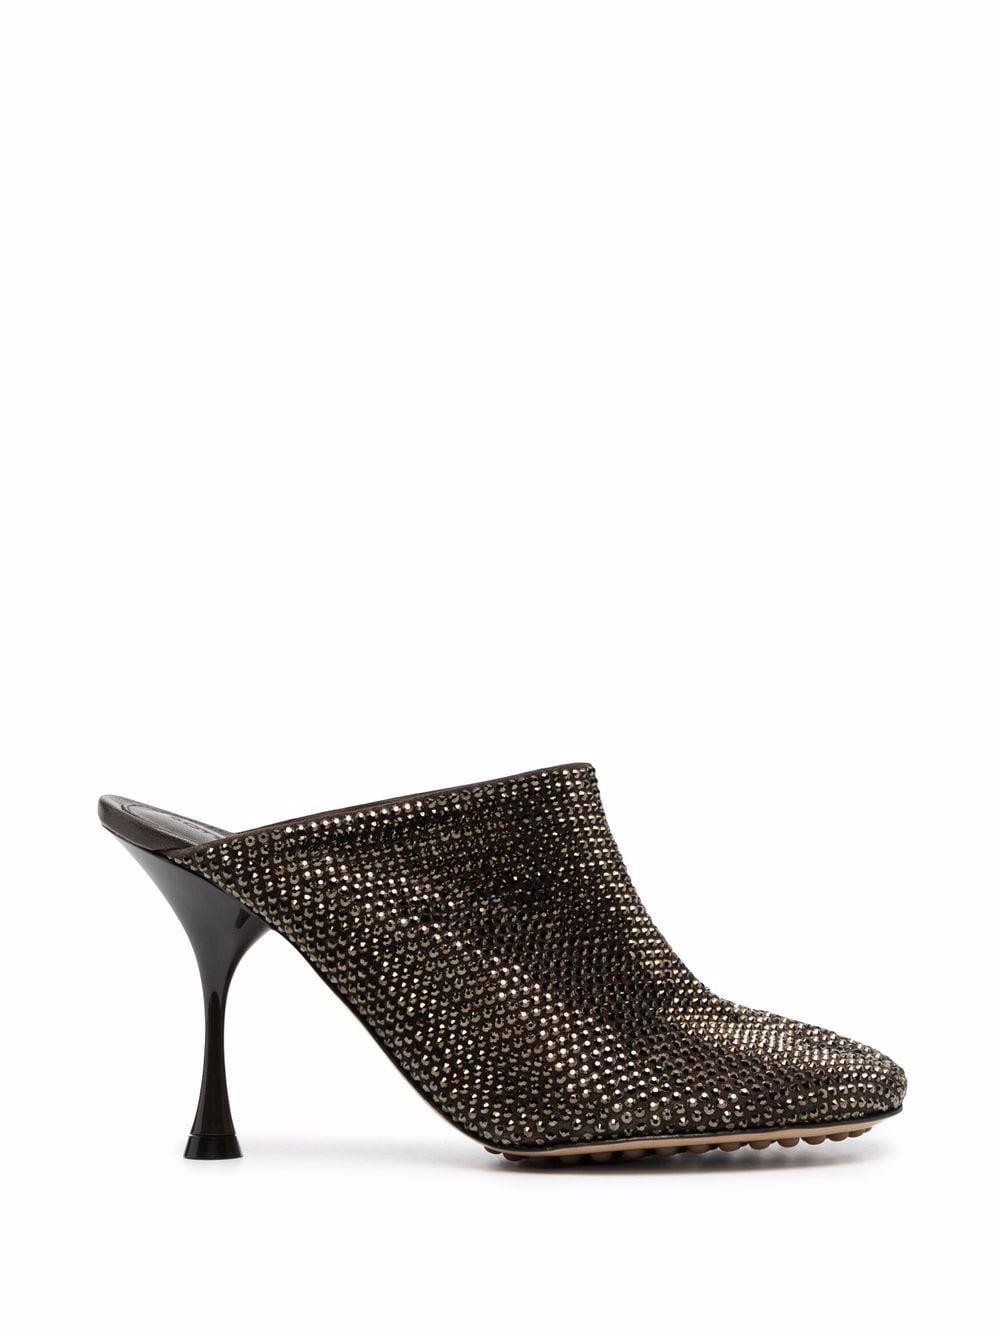 Picture of Bottega Veneta | Dot Sock 90Mm Embellished Mules